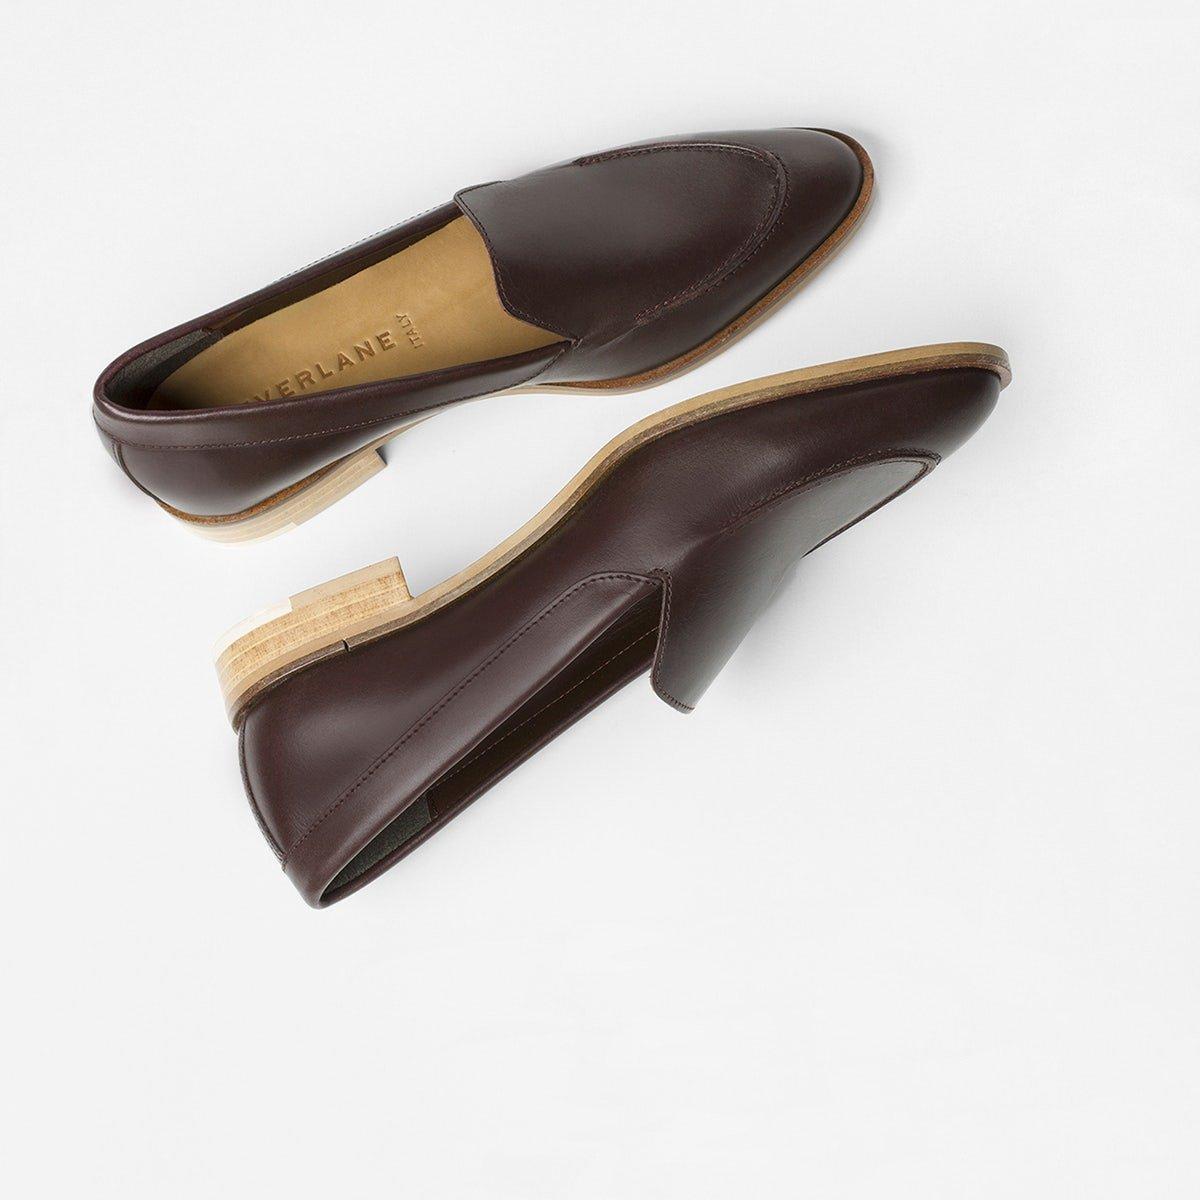 df011d3ebea Everlane Modern Loafer in burgundy. Details at une femme d un certain age.